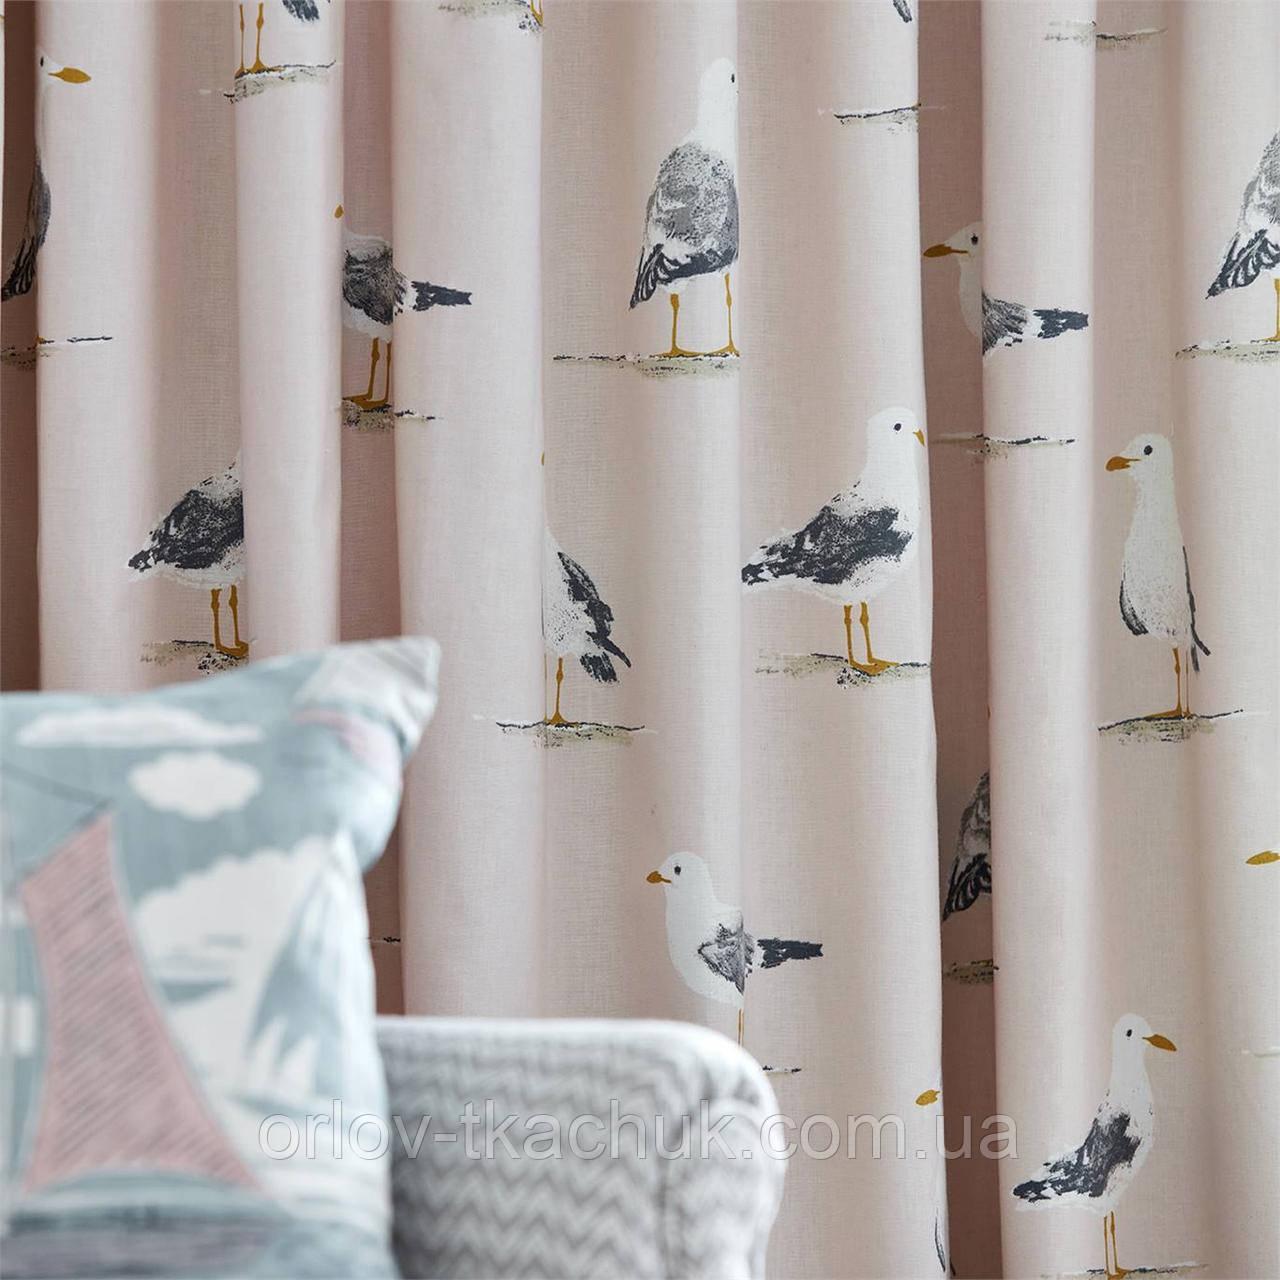 Інтер'єрна тканина Shore Birds Port Isaac Sanderson